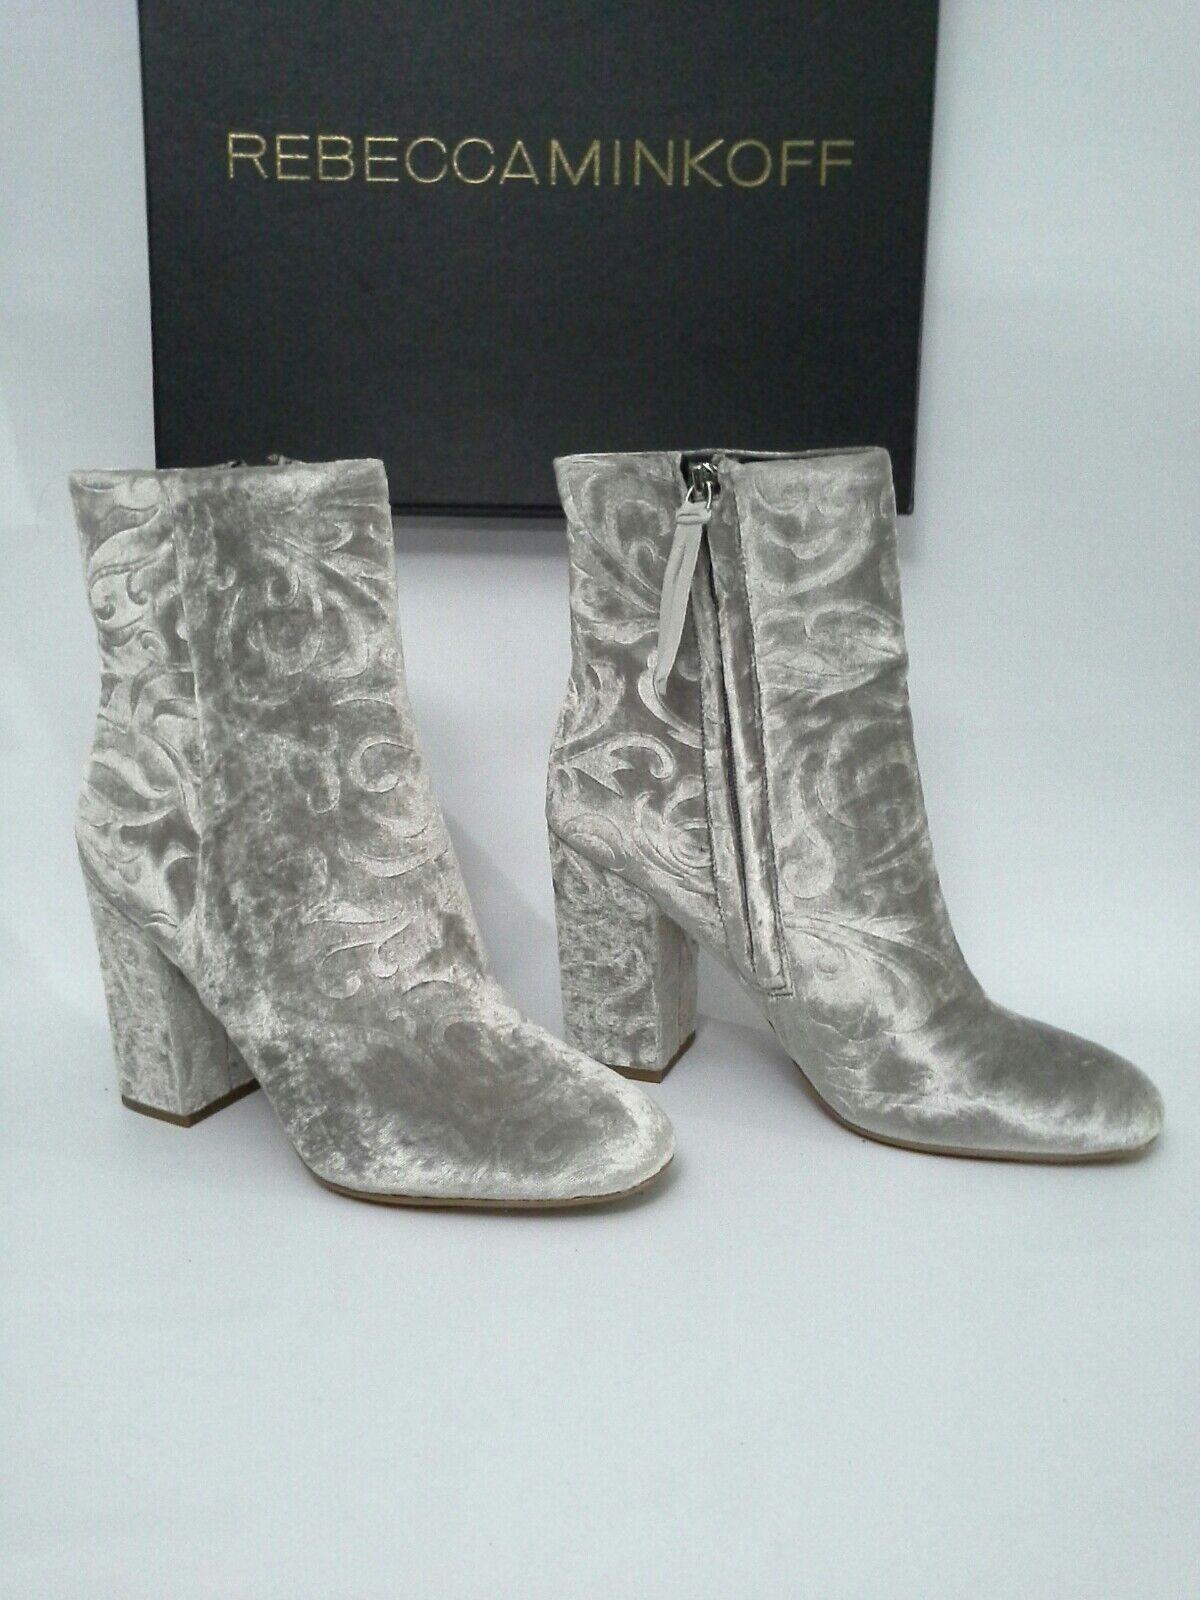 Rebecca Minkoff Bryce Floral Velvet Ankle Boot Bootie Sz 8.5  225